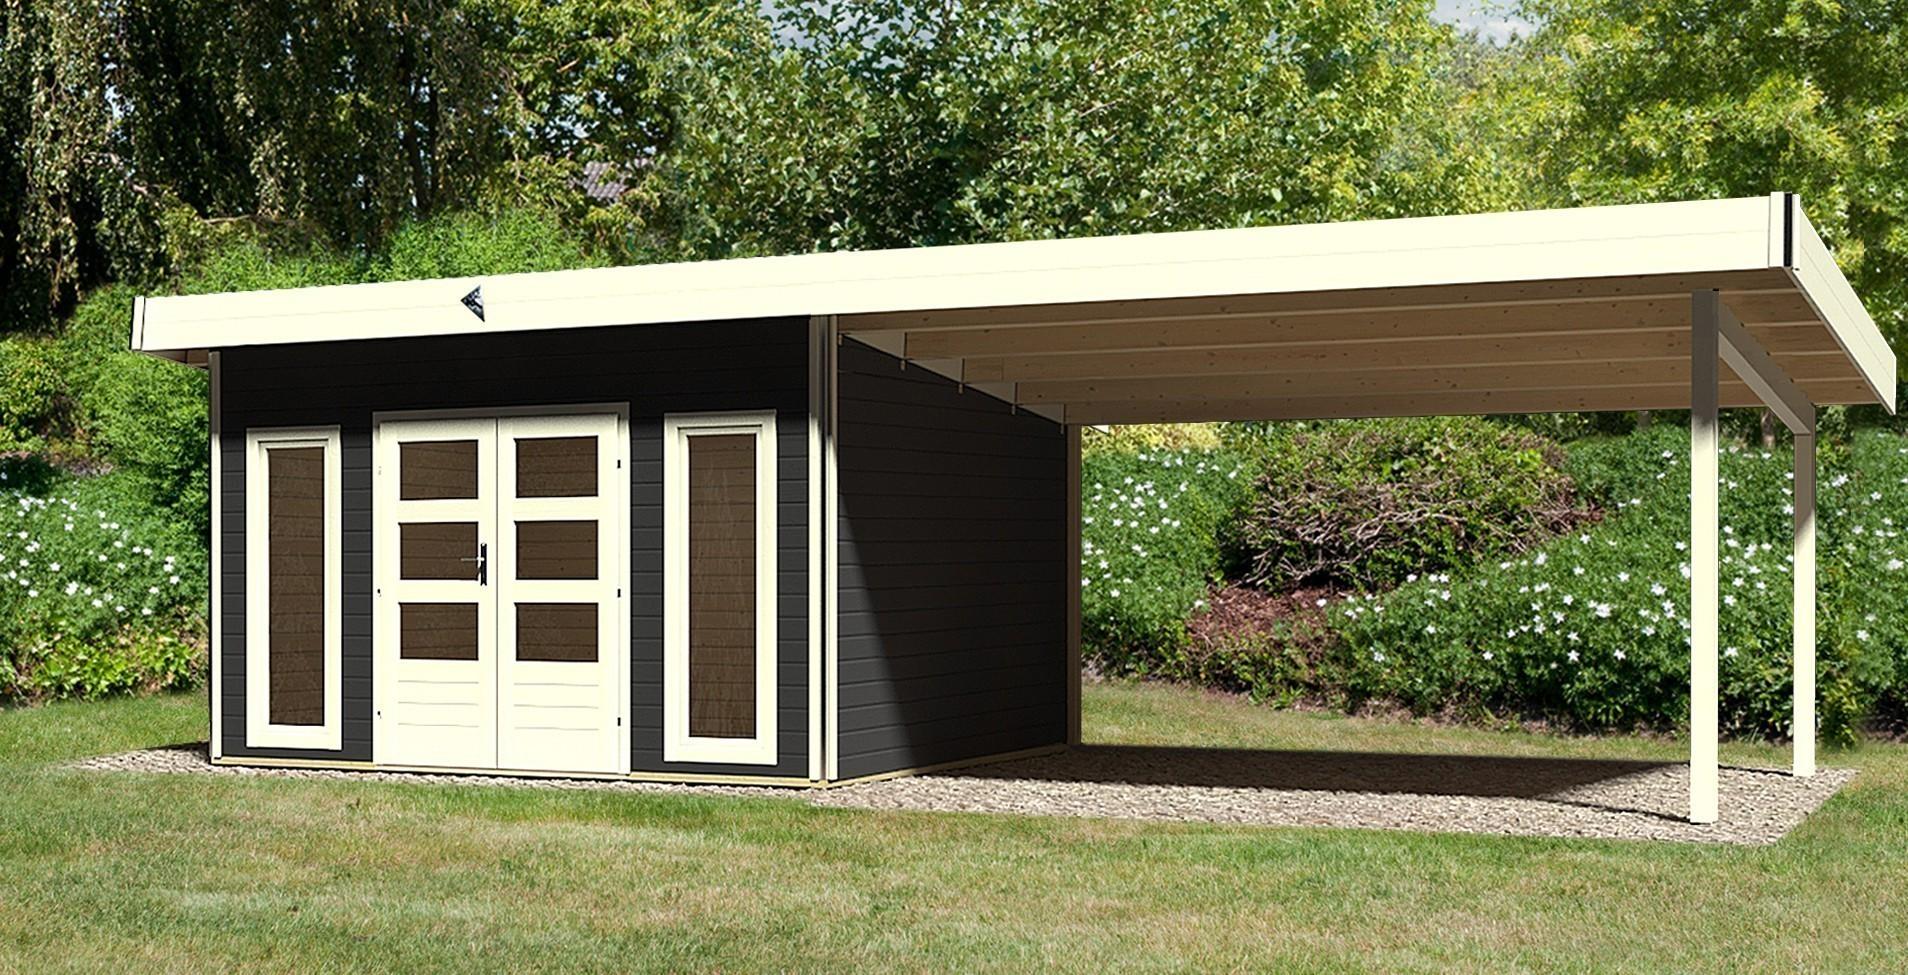 karibu gartenhaus 40mm tecklenburg 1 modern grau anbau 400 824x360cm